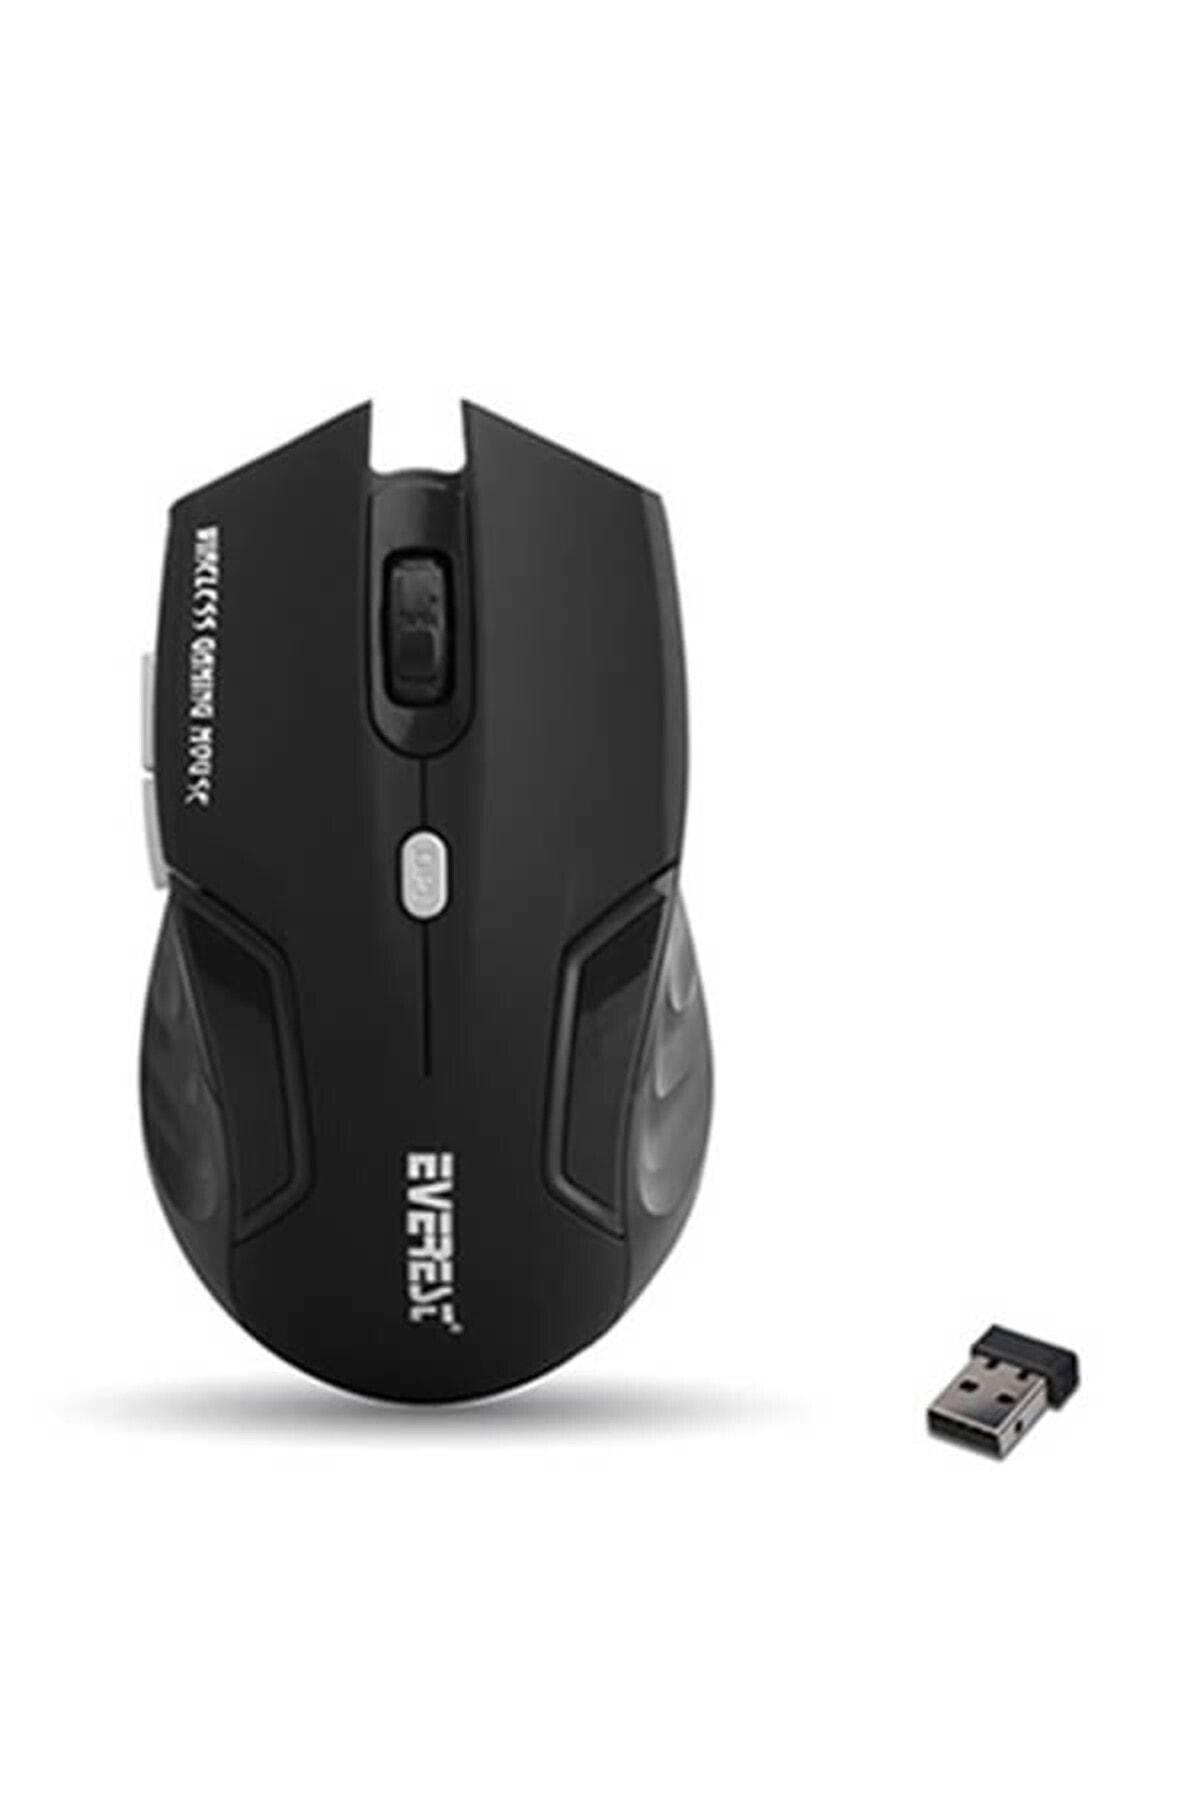 Km-230 Usb Siyah 2.4ghz Optik Kablosuz Mouse